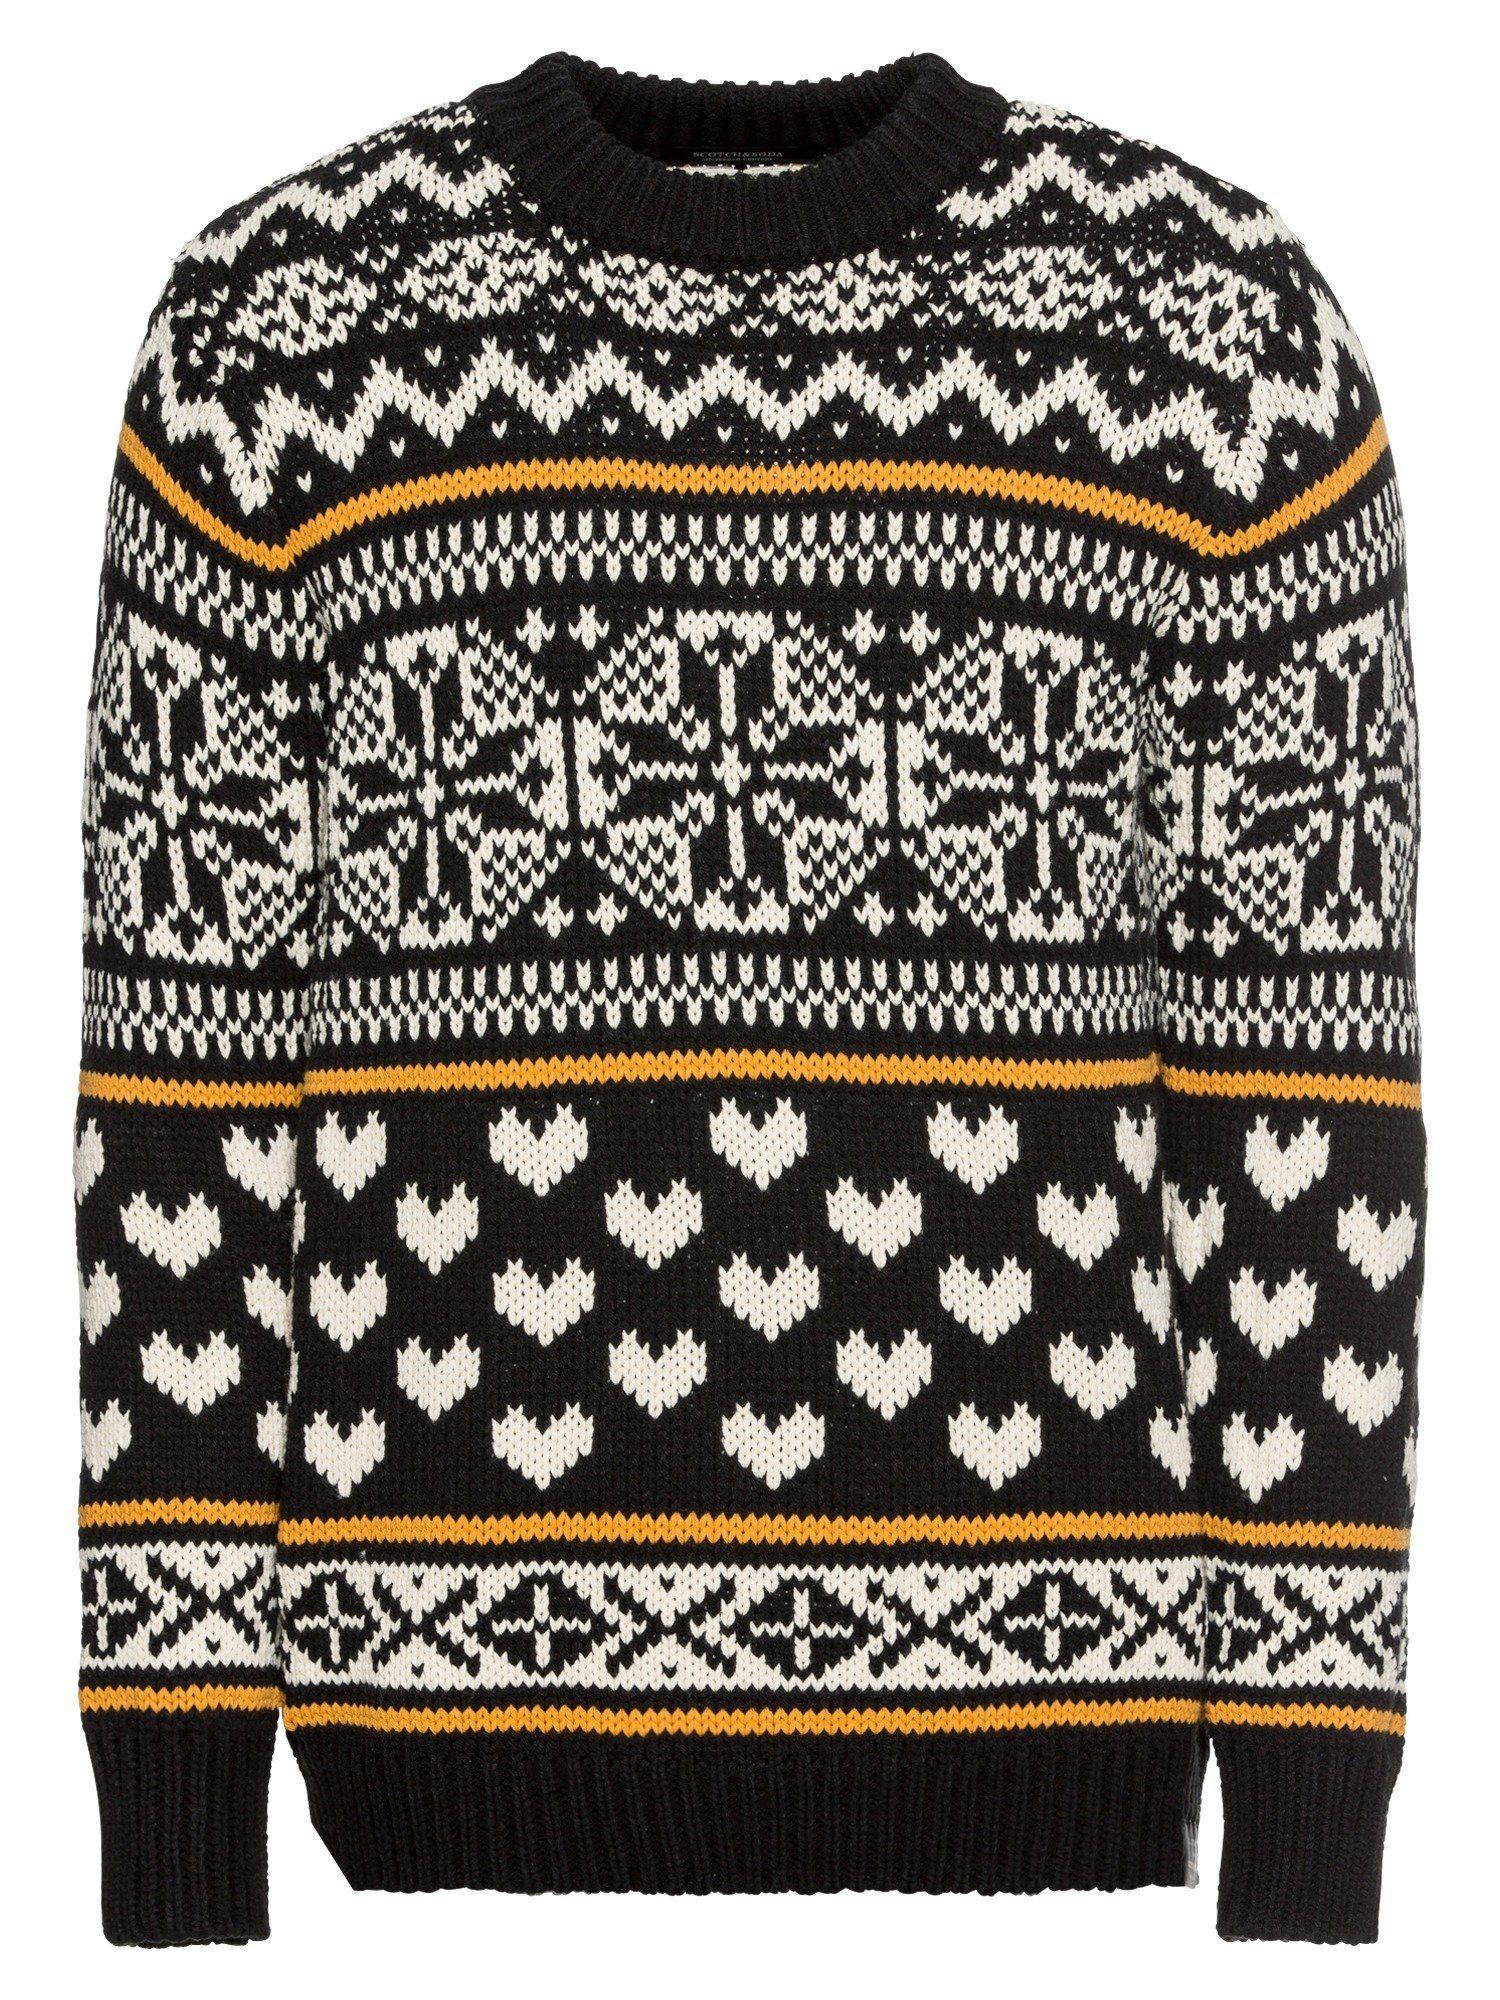 Scotch & Soda Norwegerpullover »Chunky pullover with fair isle intarsia patterns«